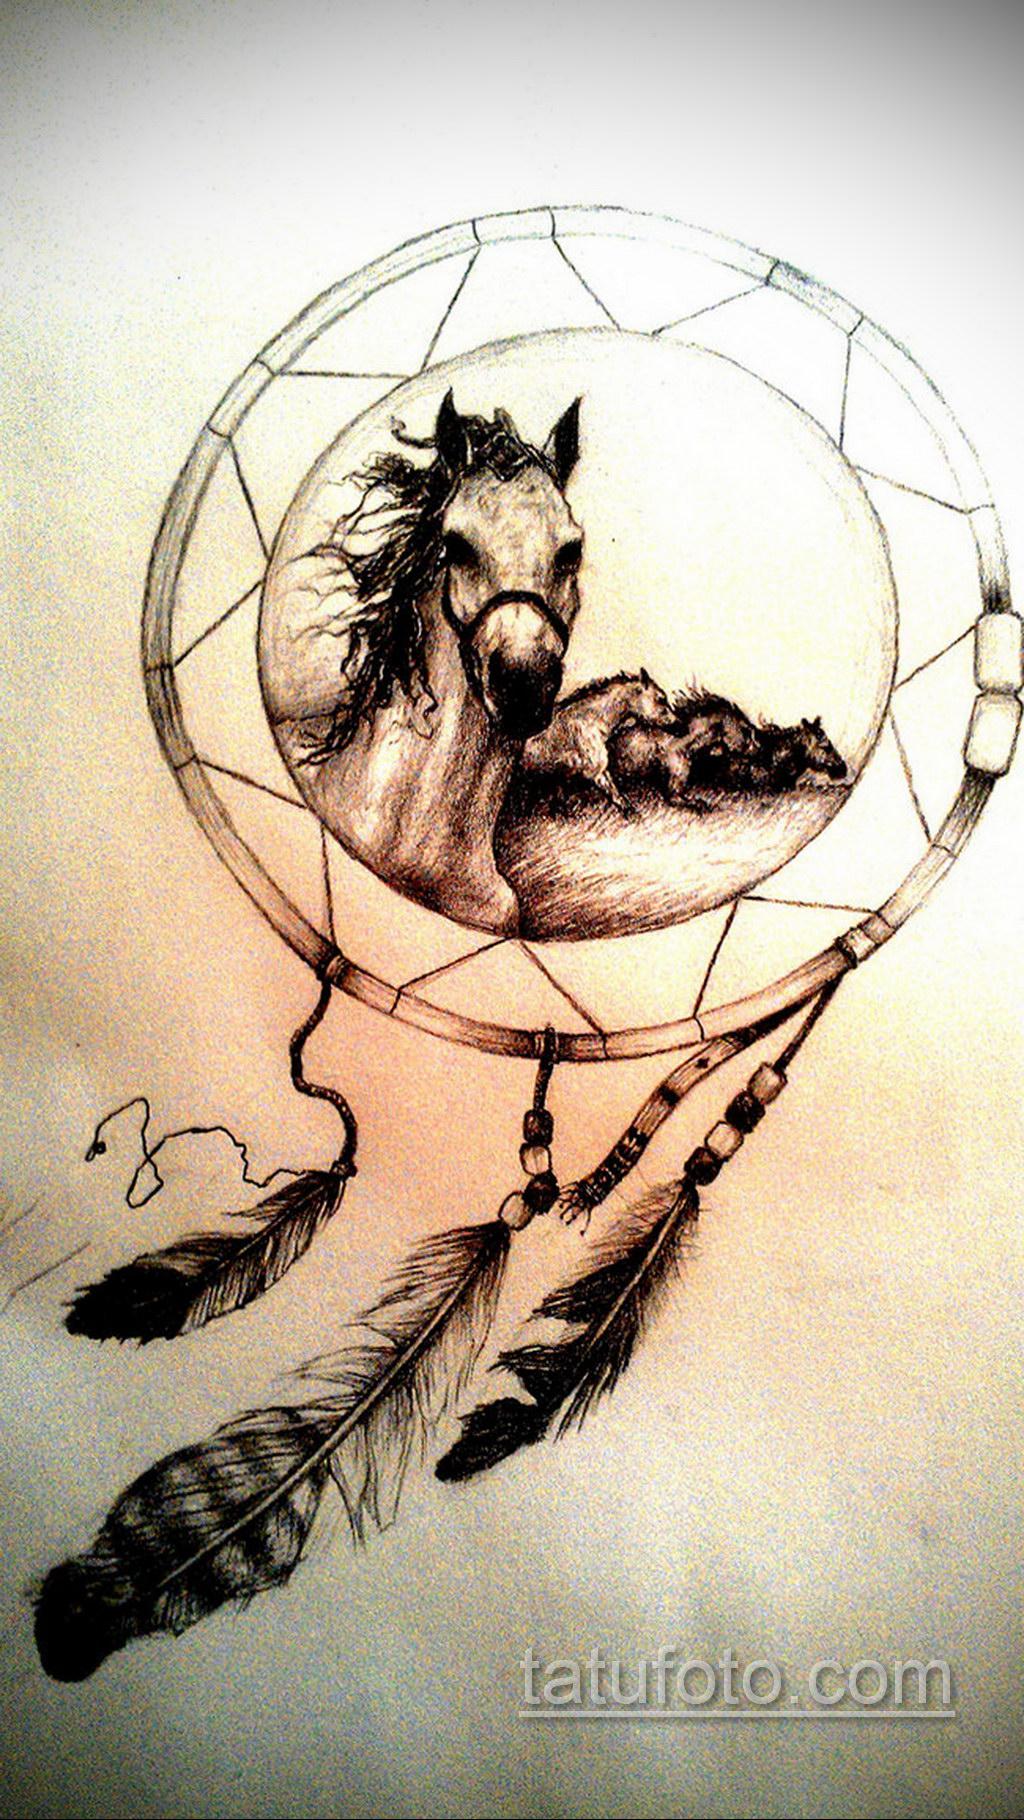 Фото рисунка тату с ловцом снов 22.11.2020 №429 -Dreamcatcher tattoo- tatufoto.com